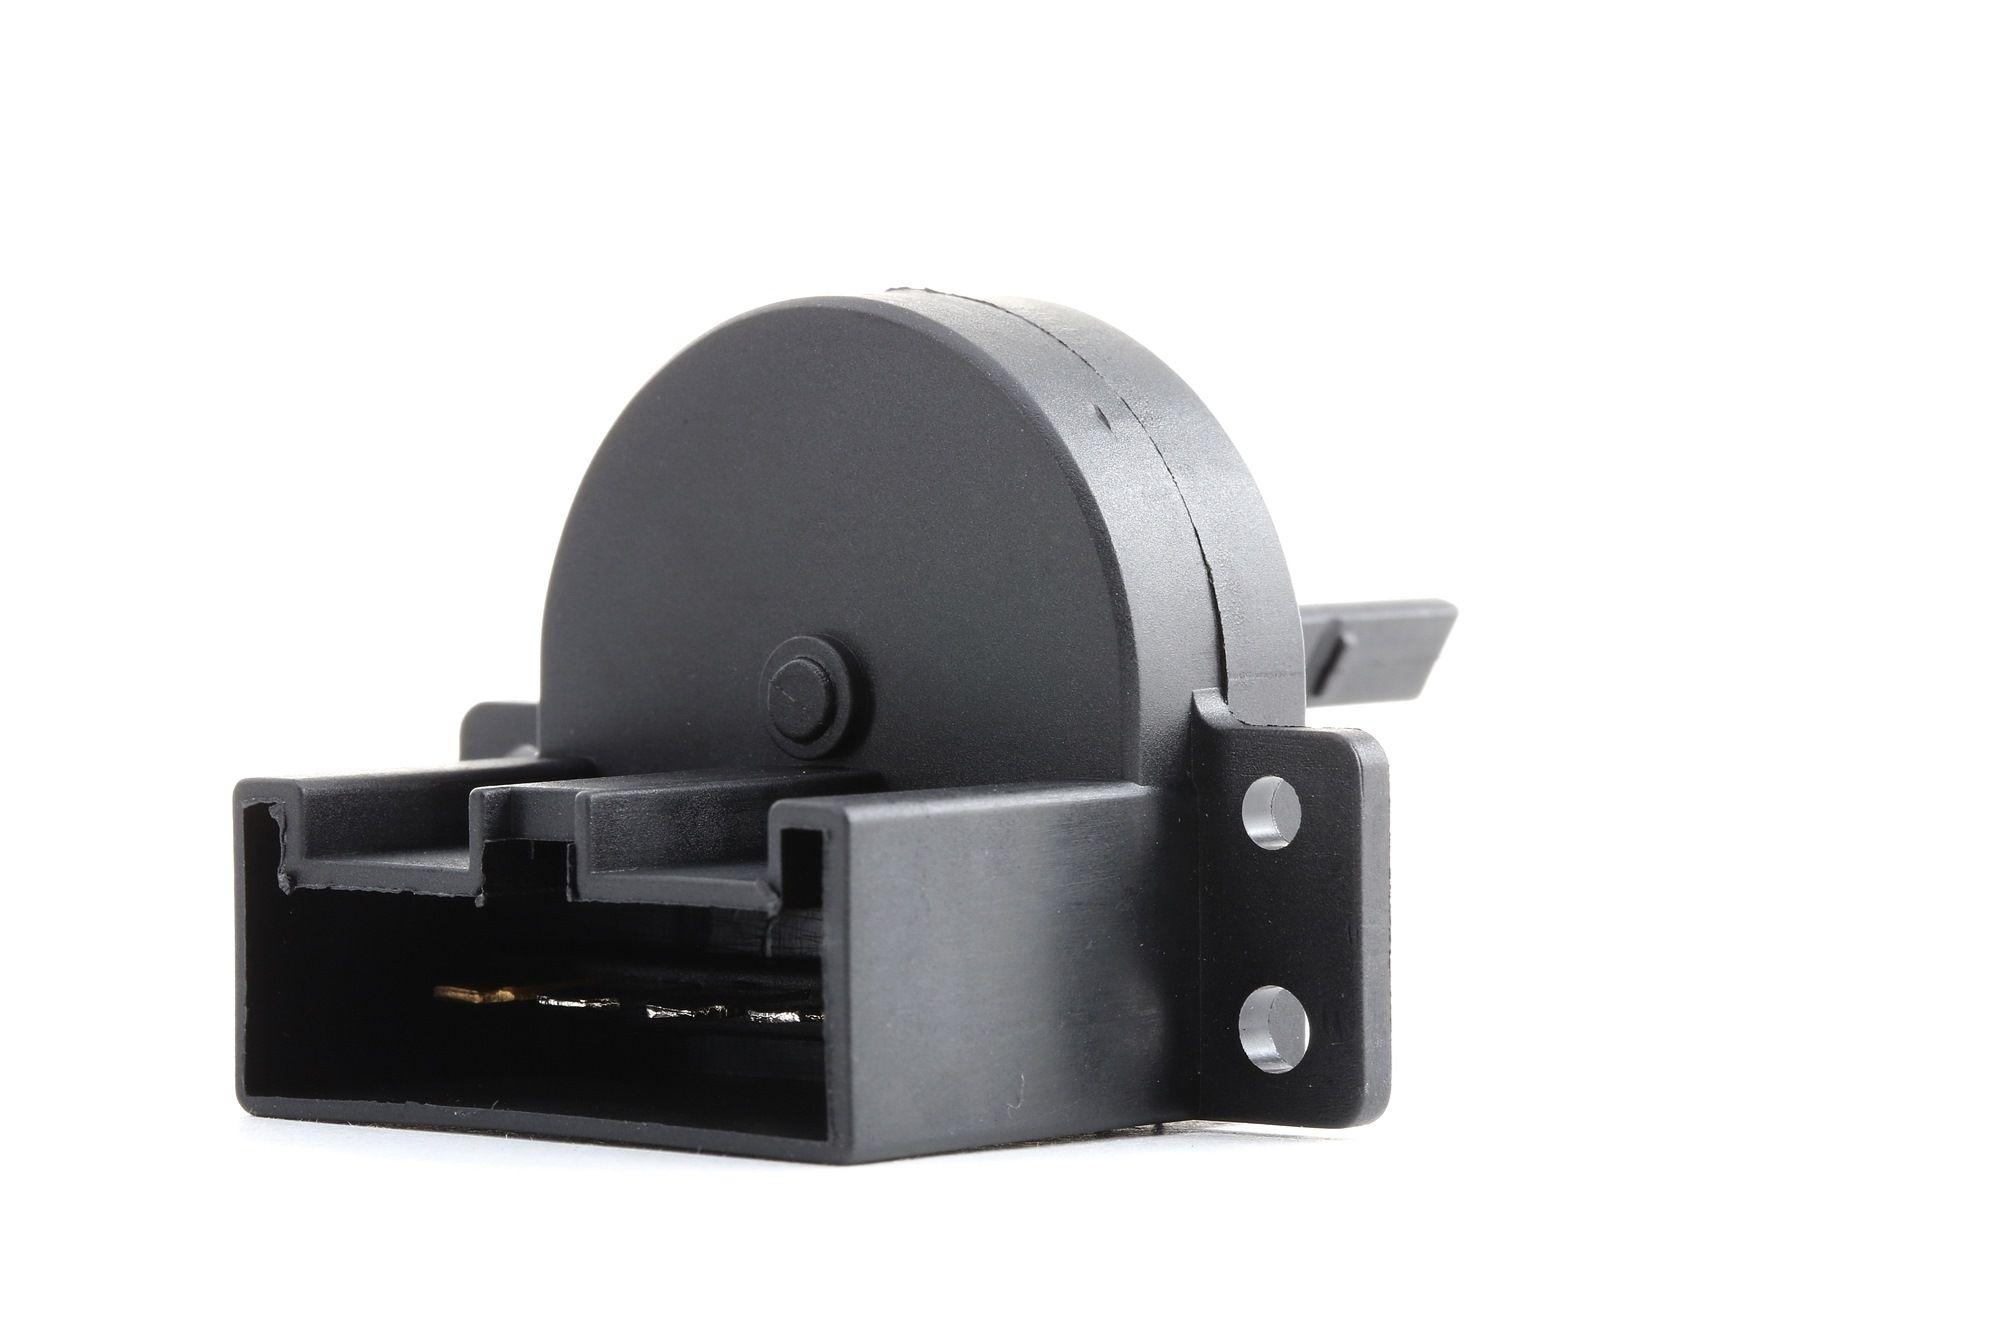 Original Verwarming / ventilatie DEF009TT Fiat